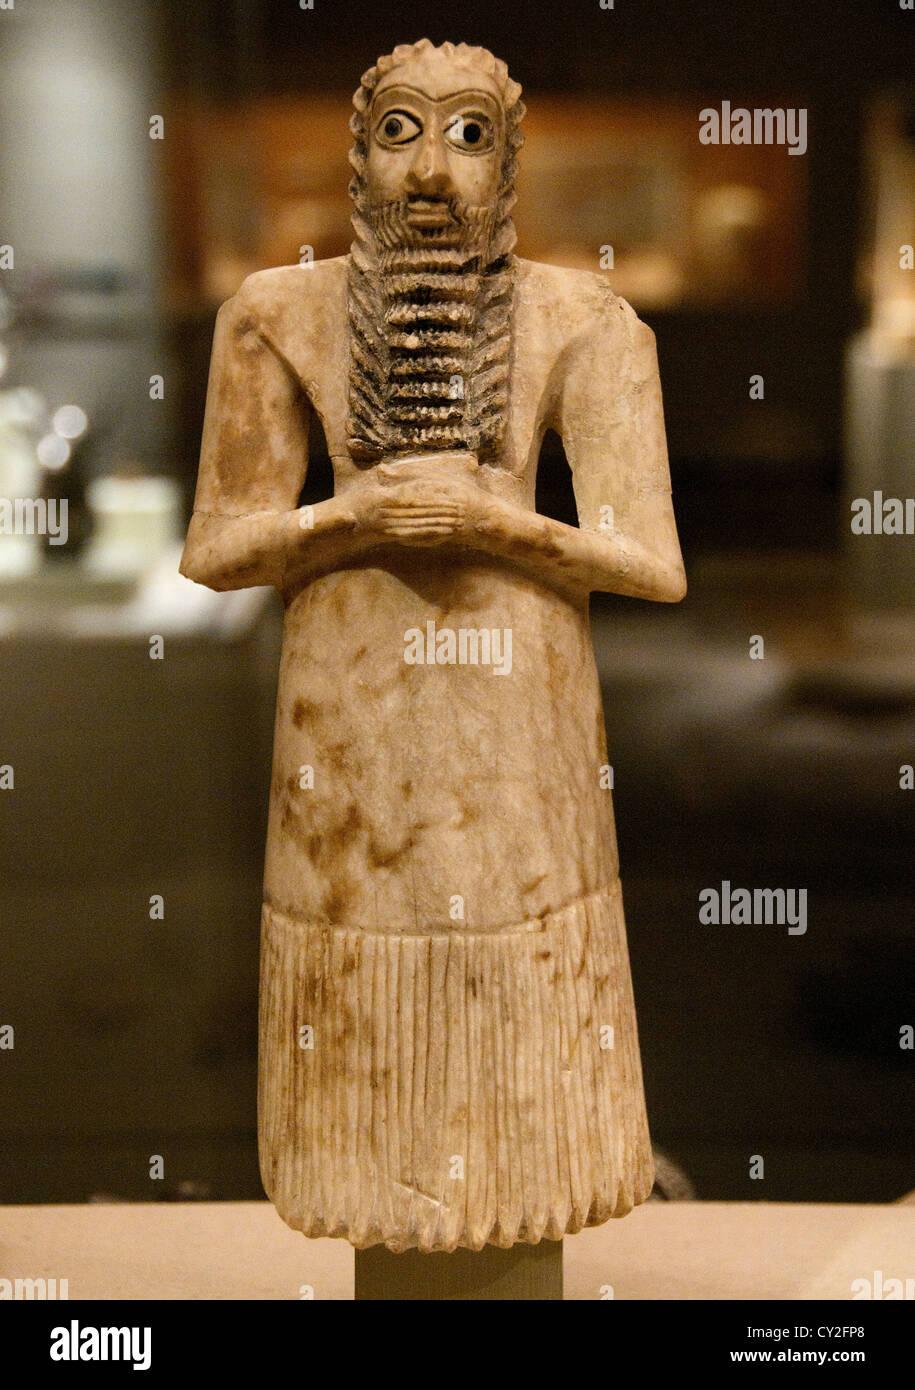 Male worshiper Early Dynastic I-II  2900–2600 BC  Mesopotamia Eshnunna Tell Asmar Sumeria Gypsum alabaster 30 cm - Stock Image